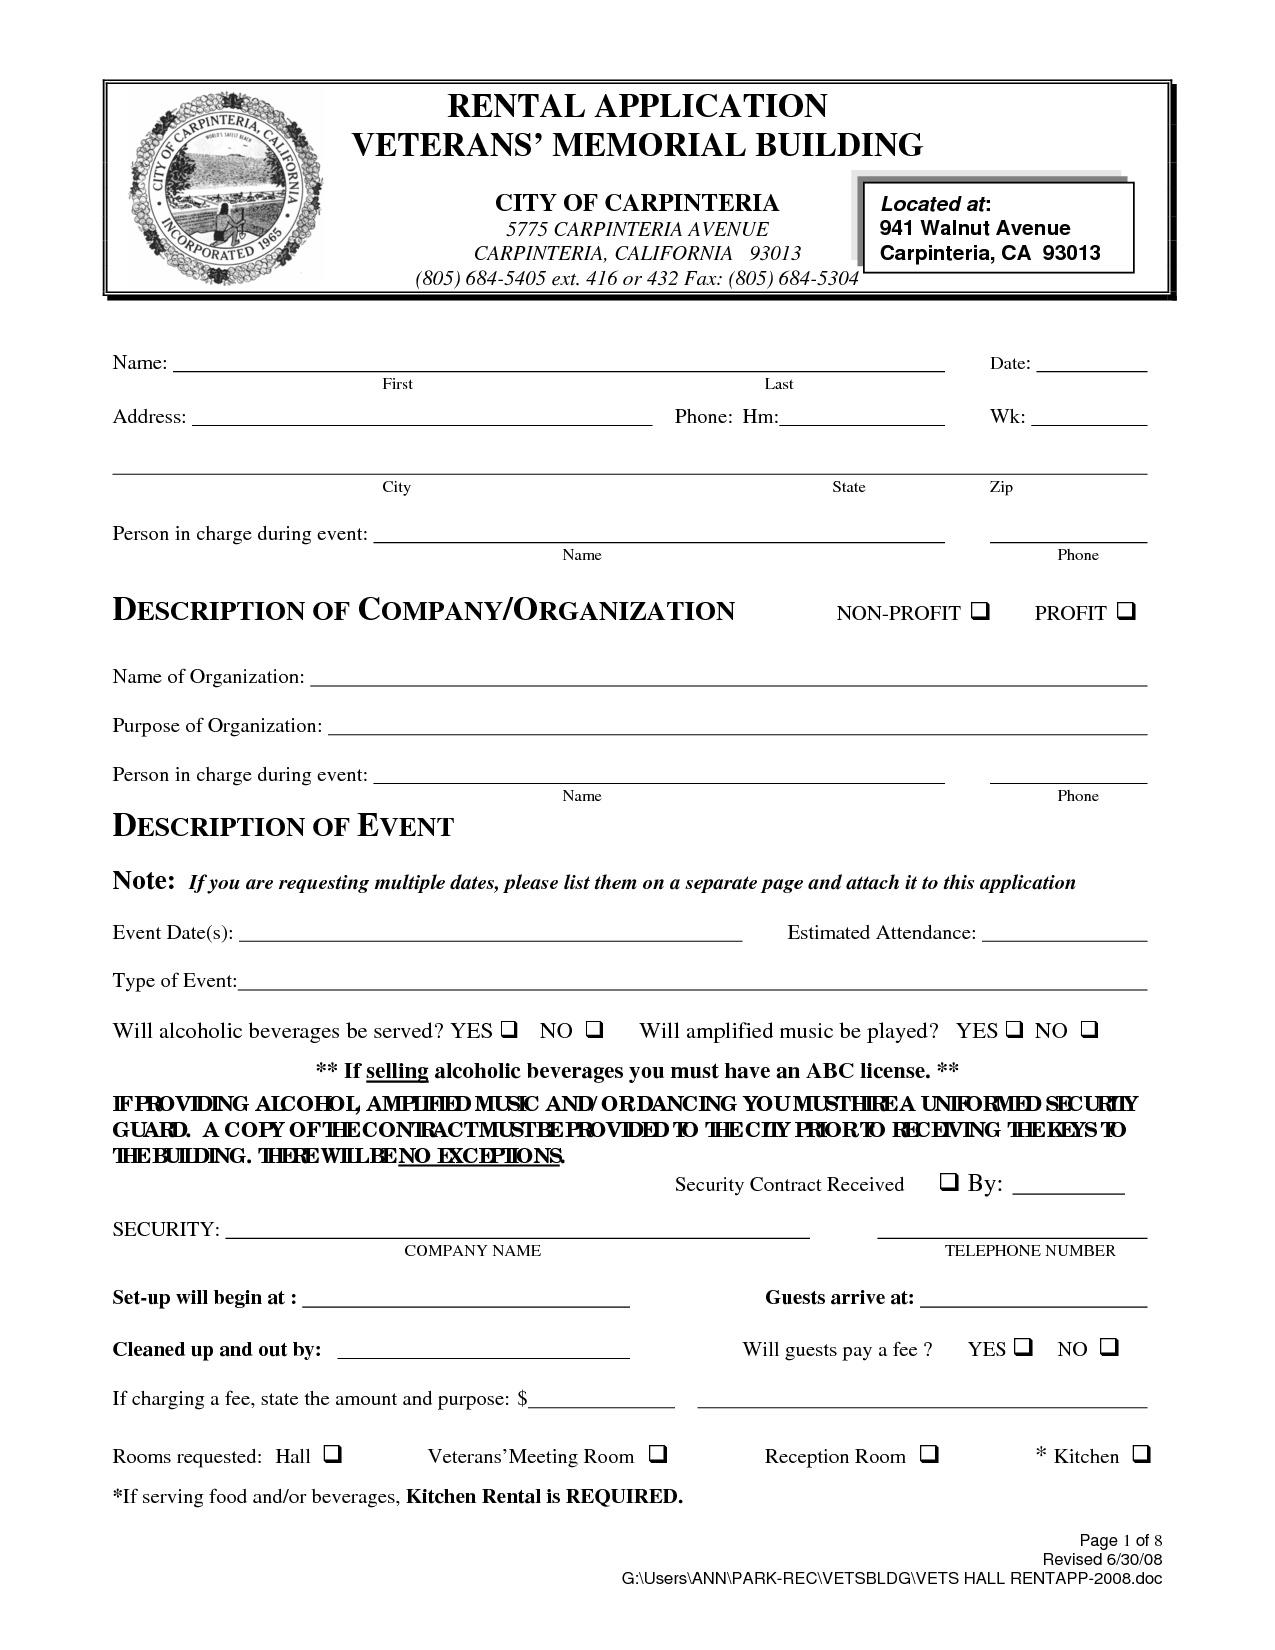 Free Printable Rental Agreement California | Shop Fresh - Free Printable California Residential Lease Agreement